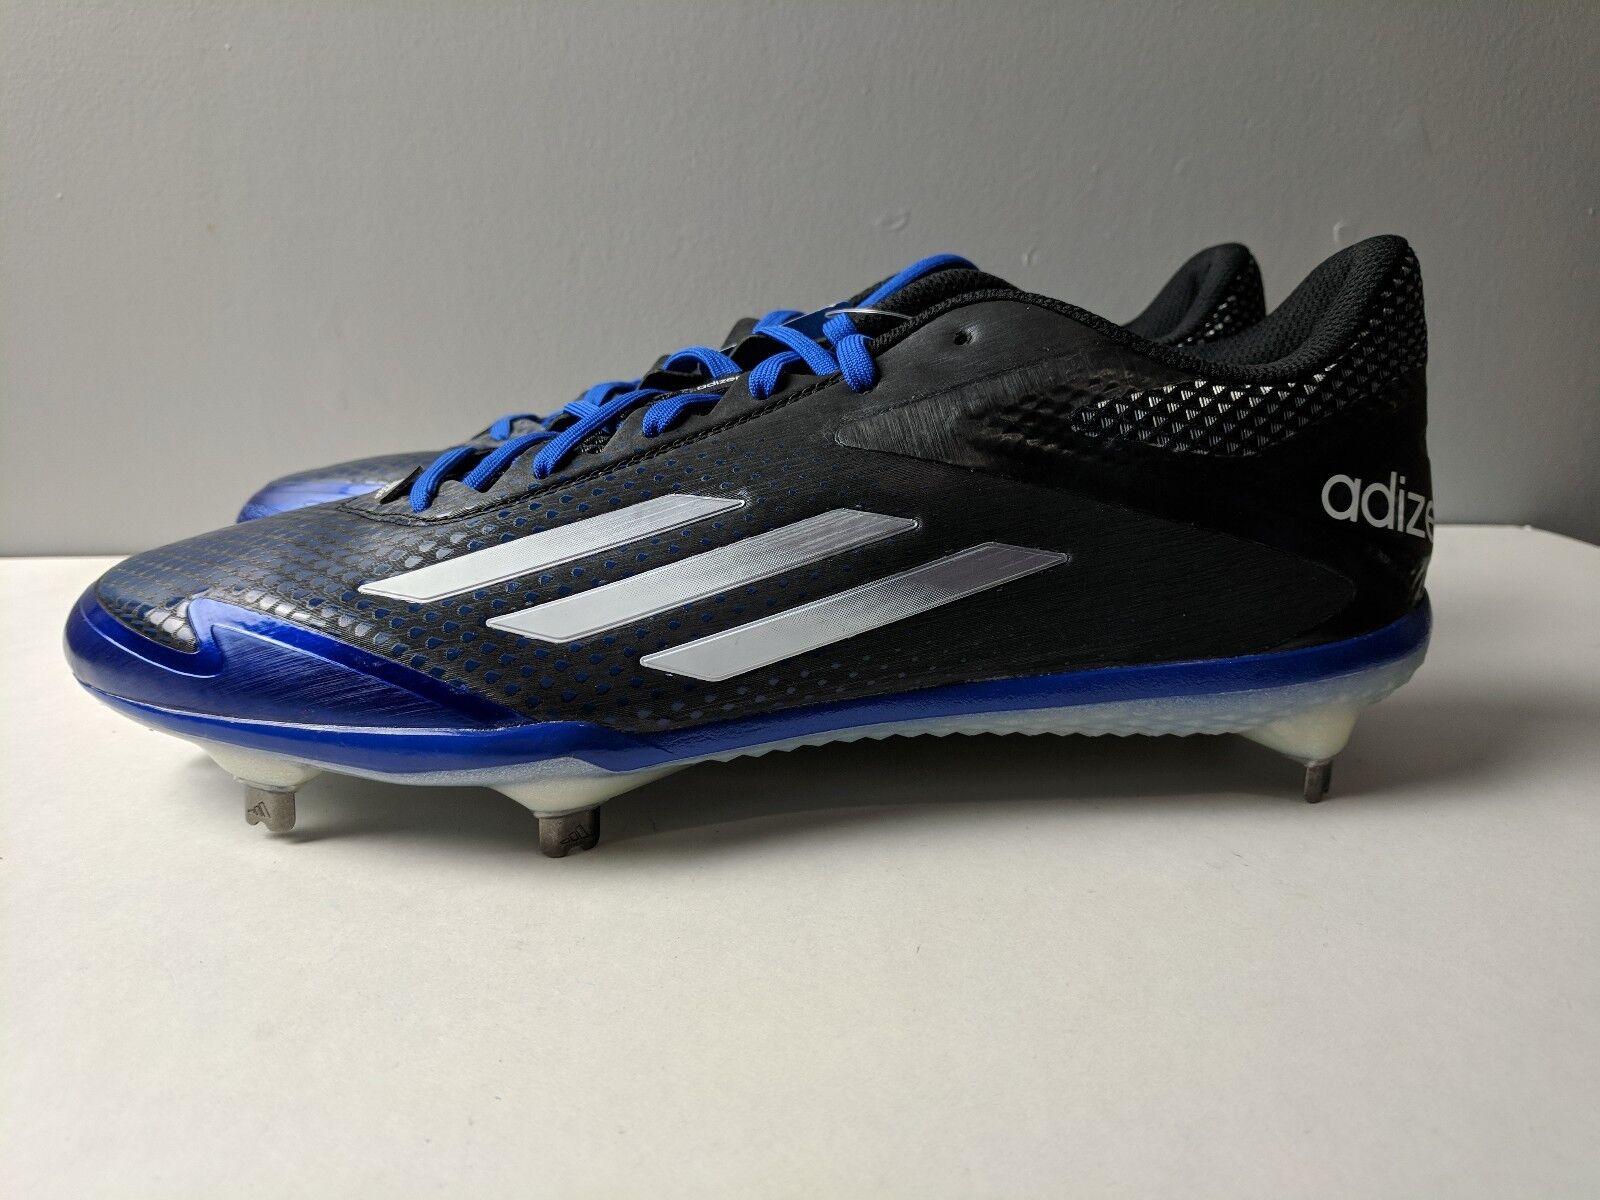 Adidas Adizero Afterburner 2.0 Cleats Men's Baseball shoes Brand New Size 10.5